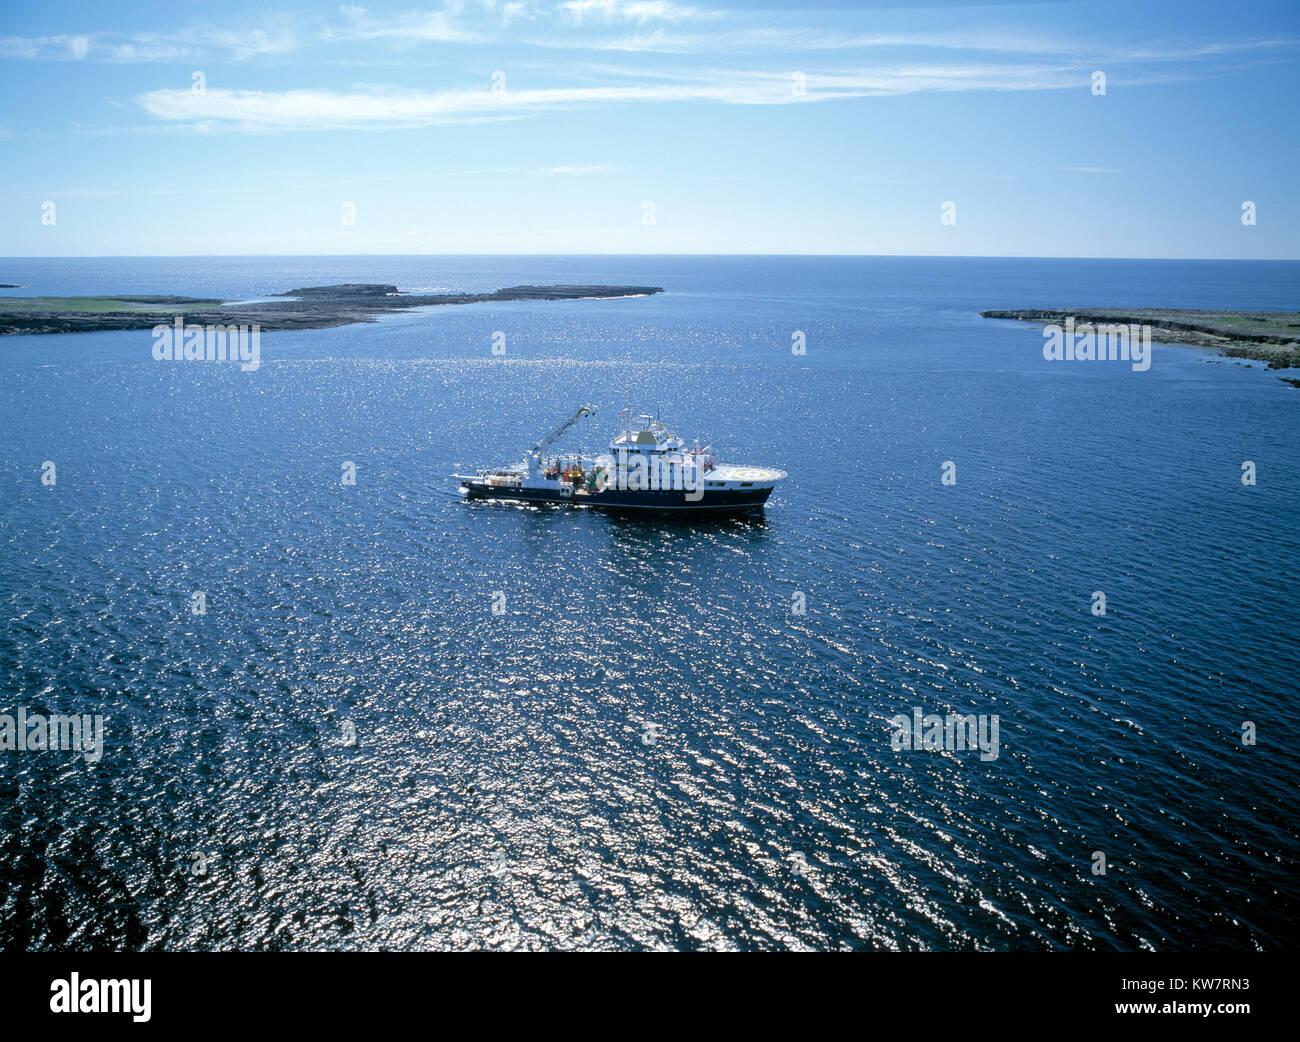 iriish lights service ship off west coast of ireland Stock Photo